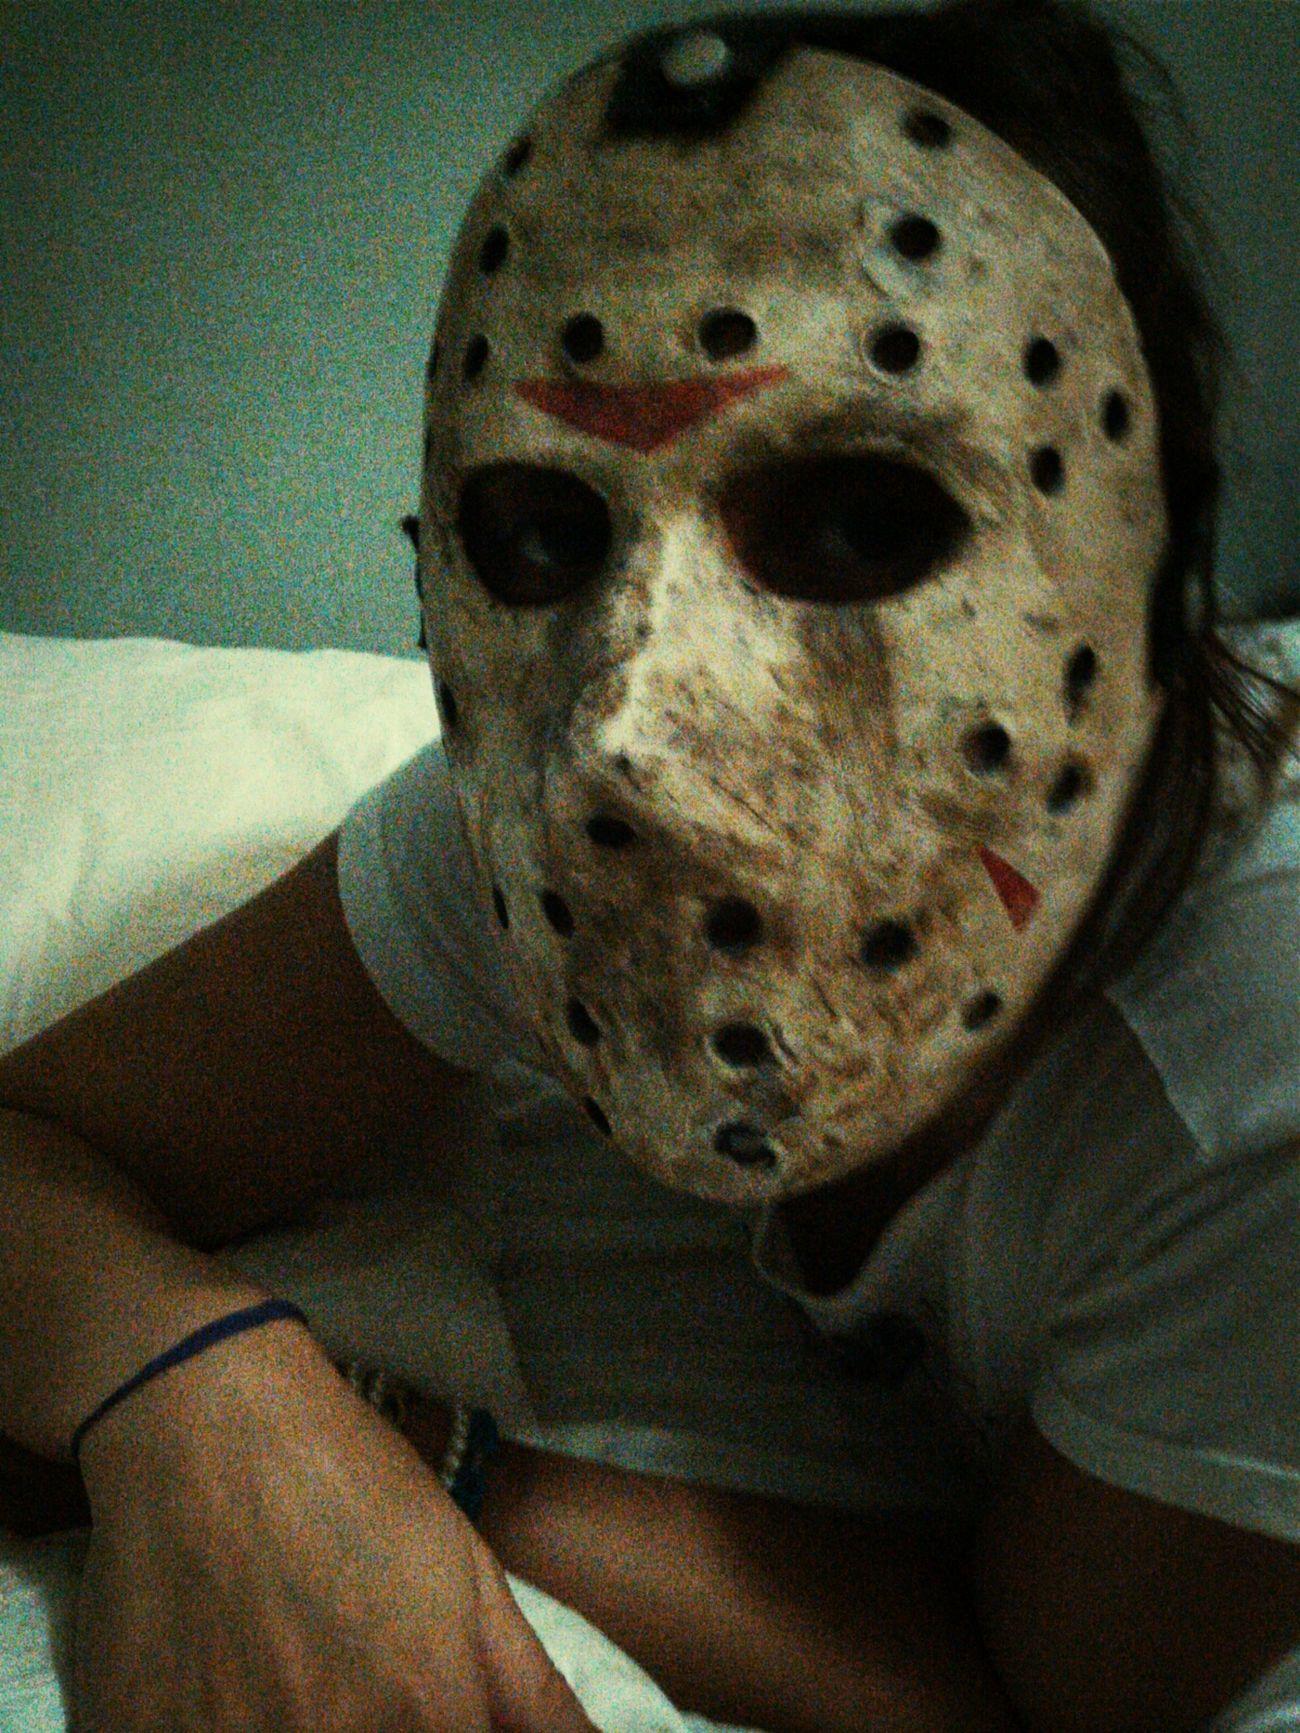 Mascara Jason Scary Face